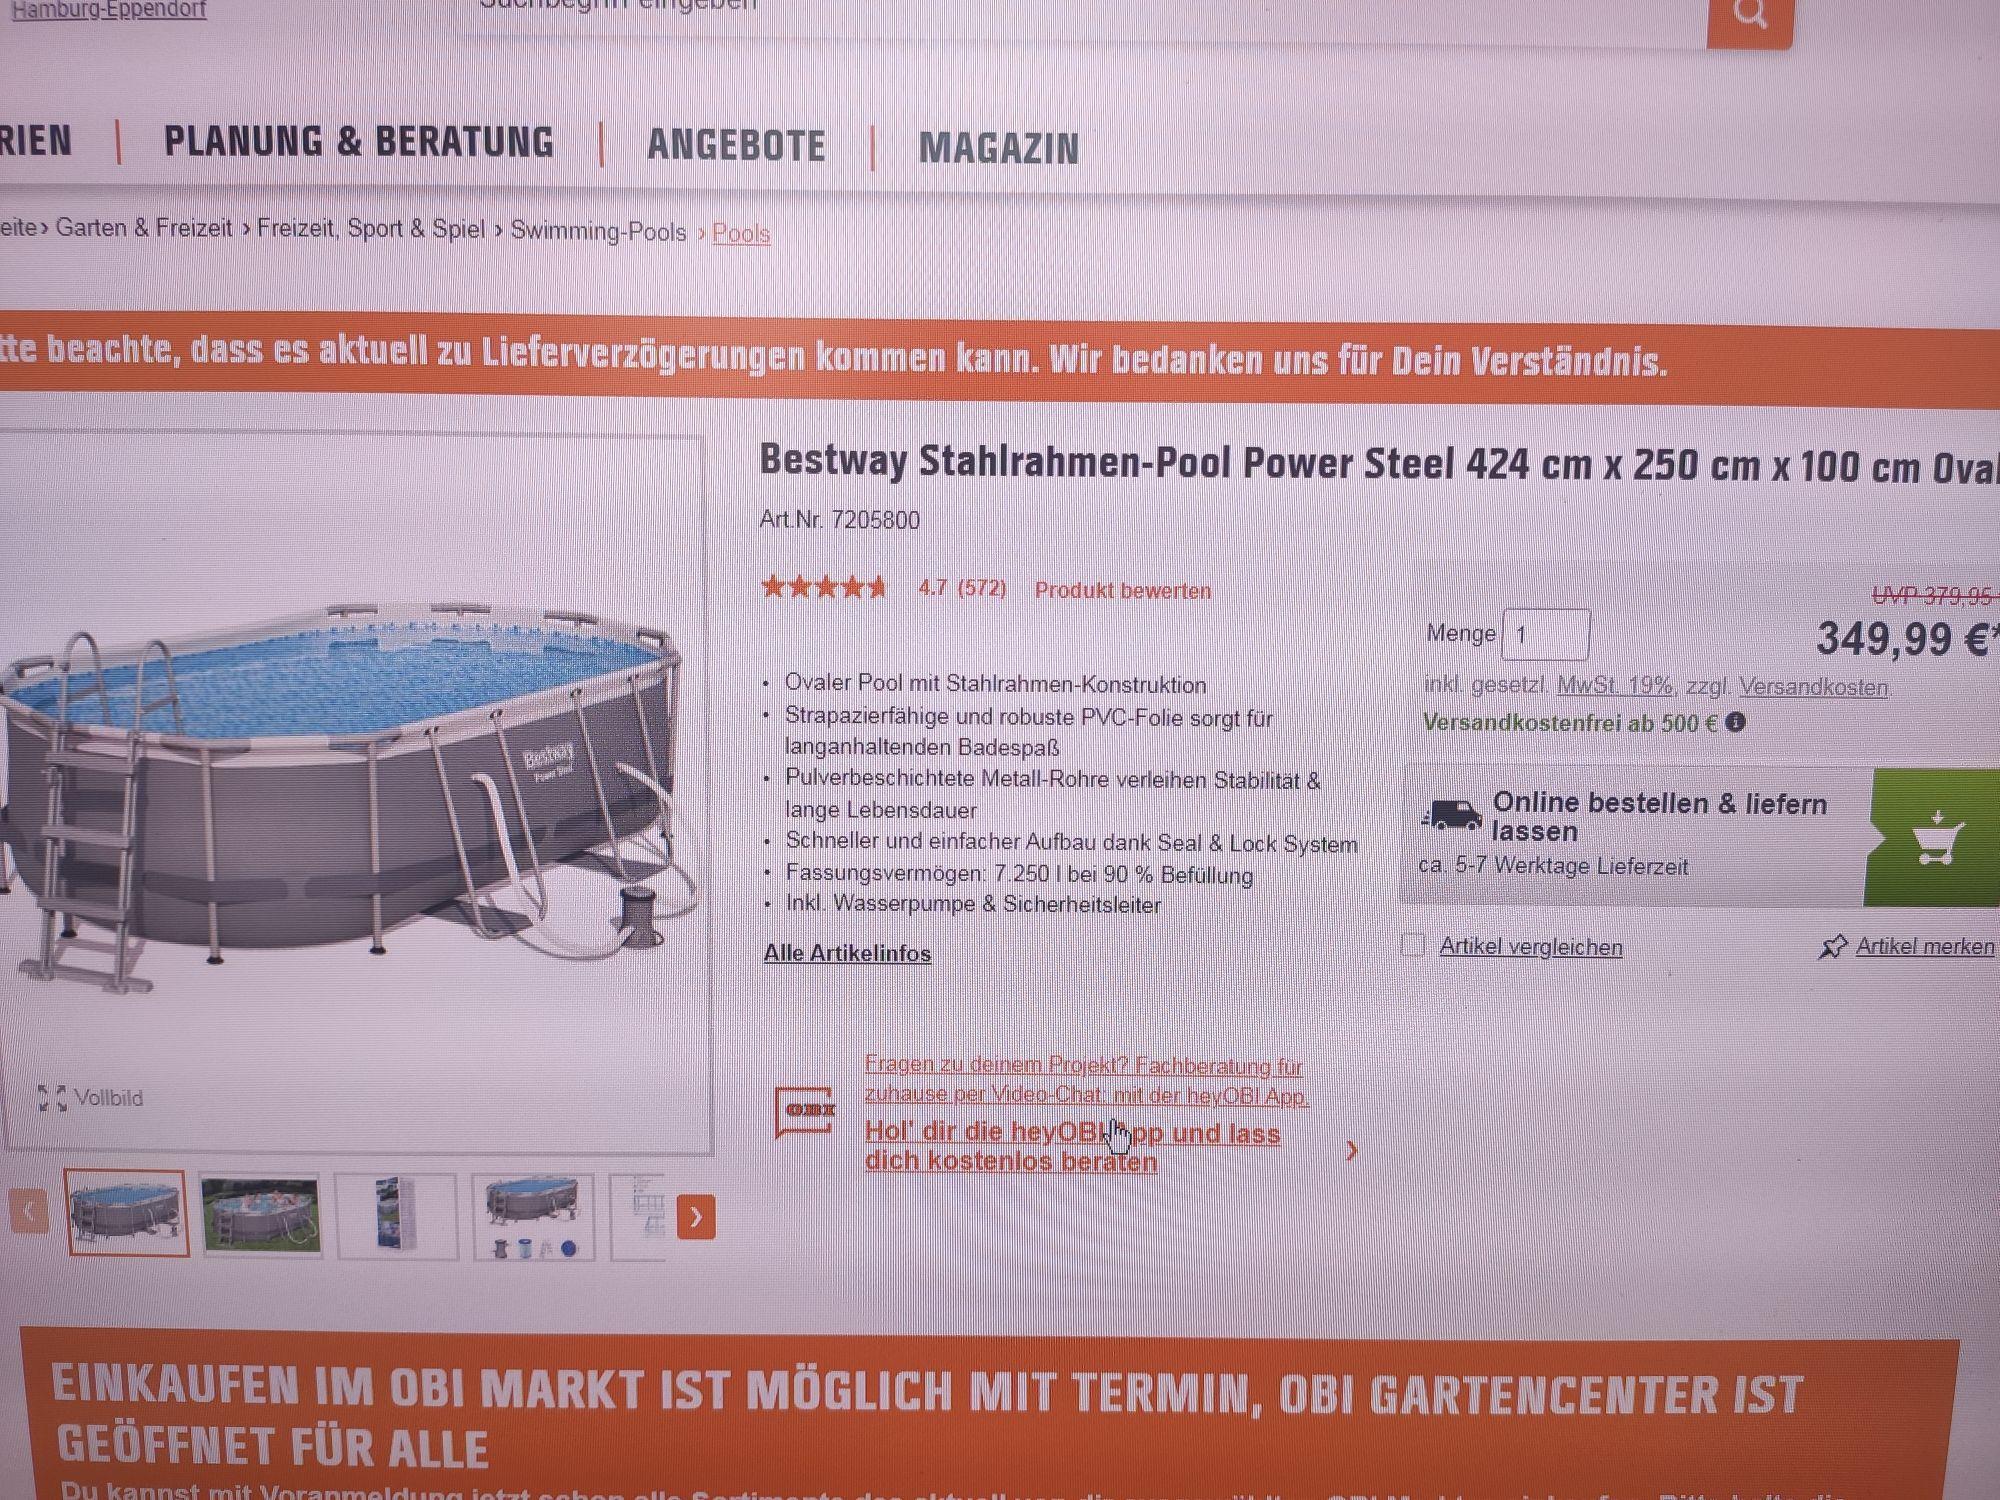 Bestway Stahlrahmen-Pool Power Steel 424 cm x 250 cm x 100 cm Oval